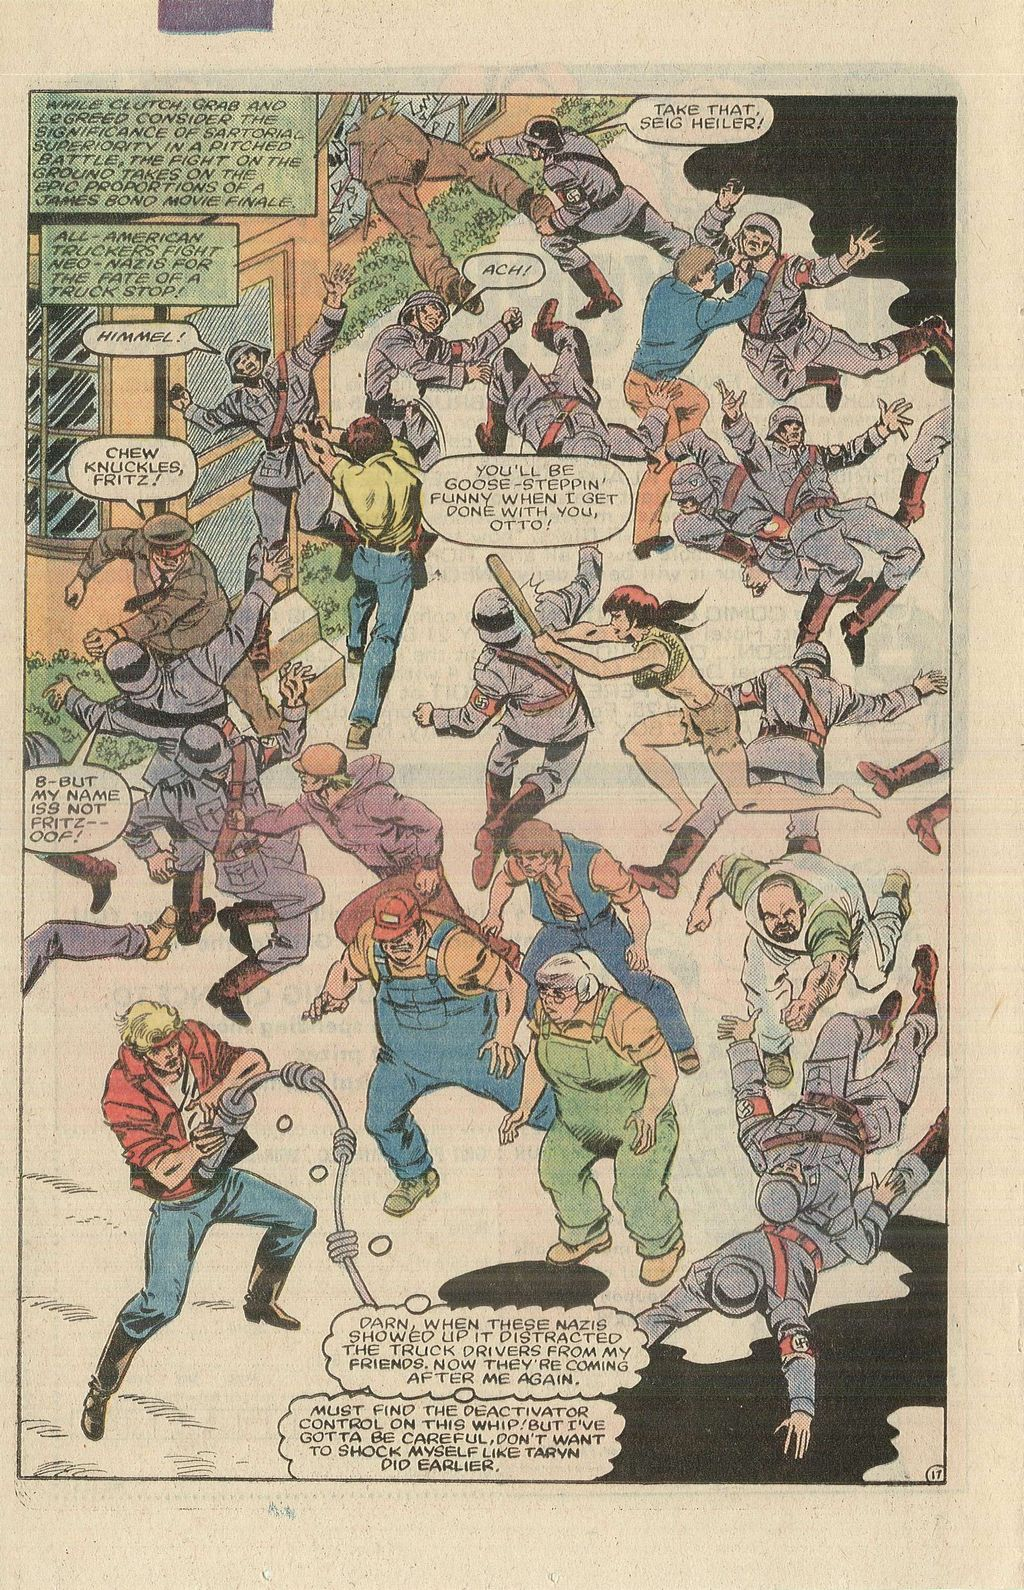 Read online U.S. 1 comic -  Issue #9 - 24